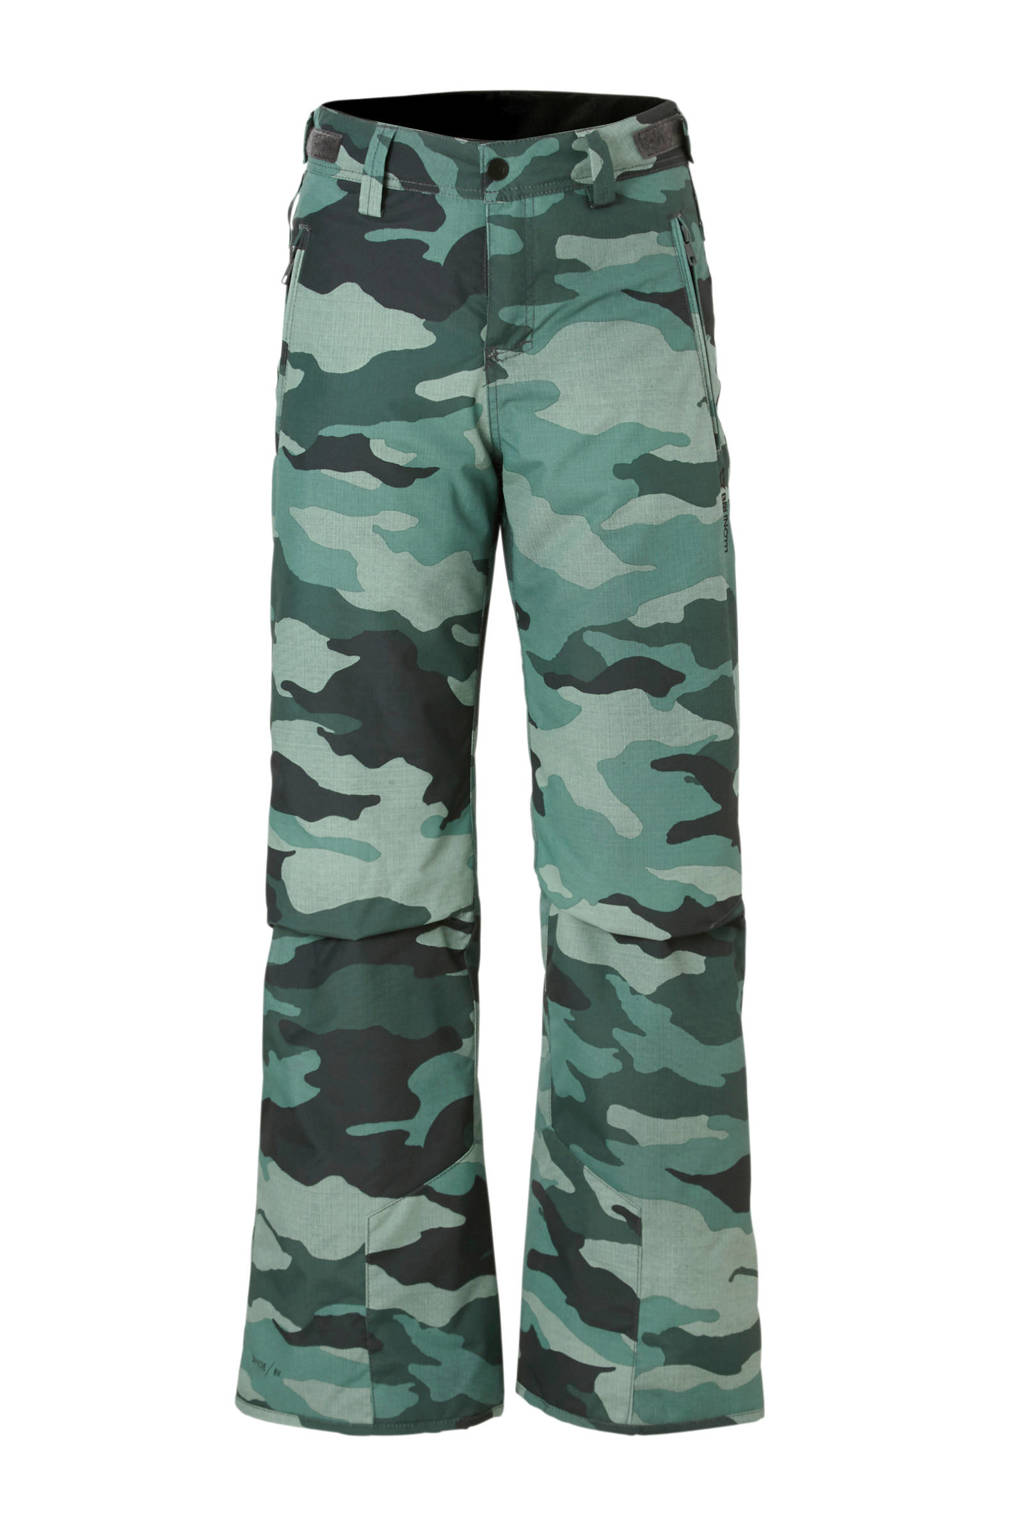 Brunotti skibroek camouflage groen, Groen